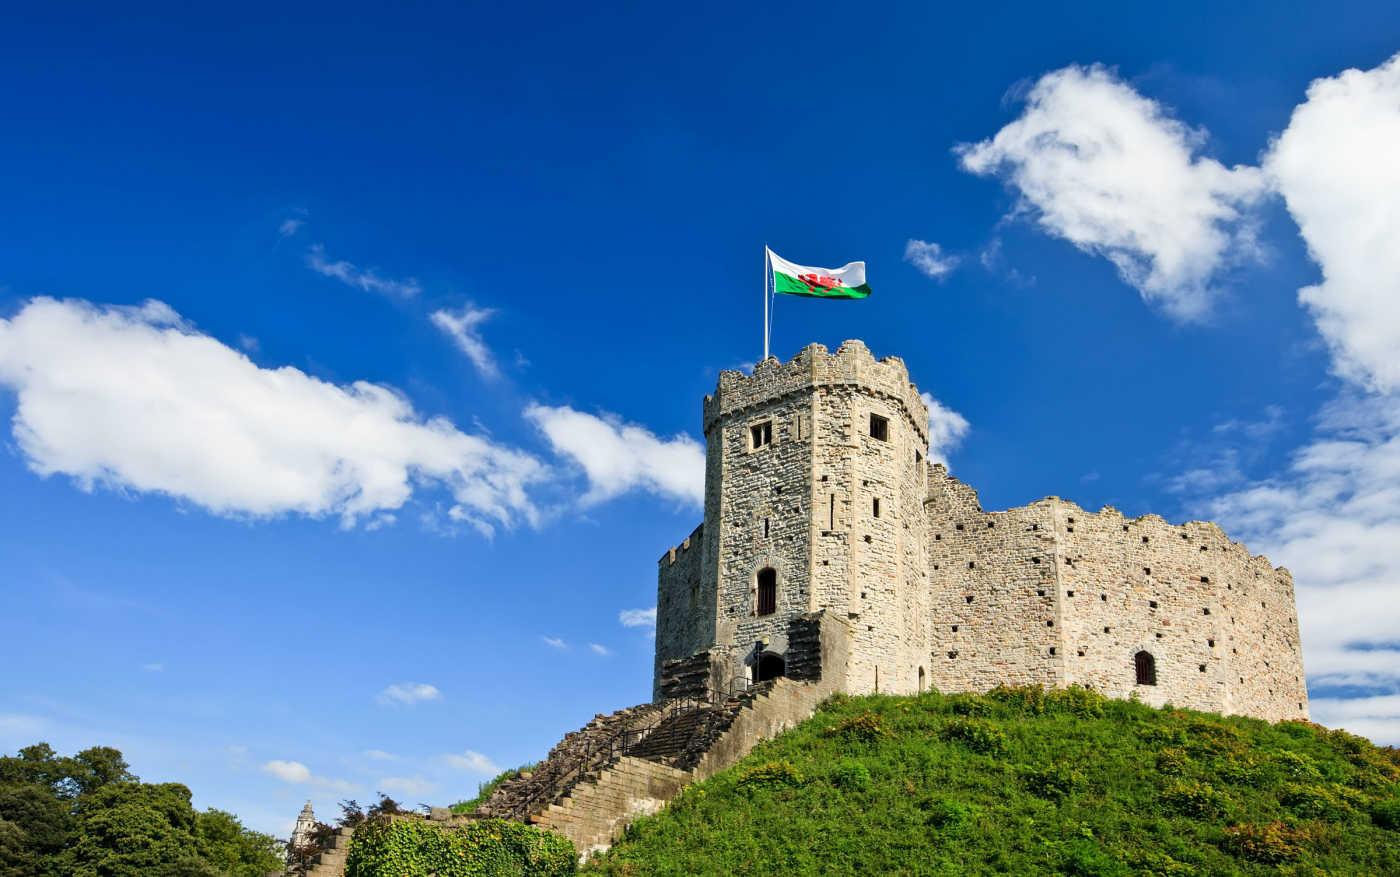 4e69ec0b68e 15 Beautiful Castles in Wales | Inspiring Travel to Wales